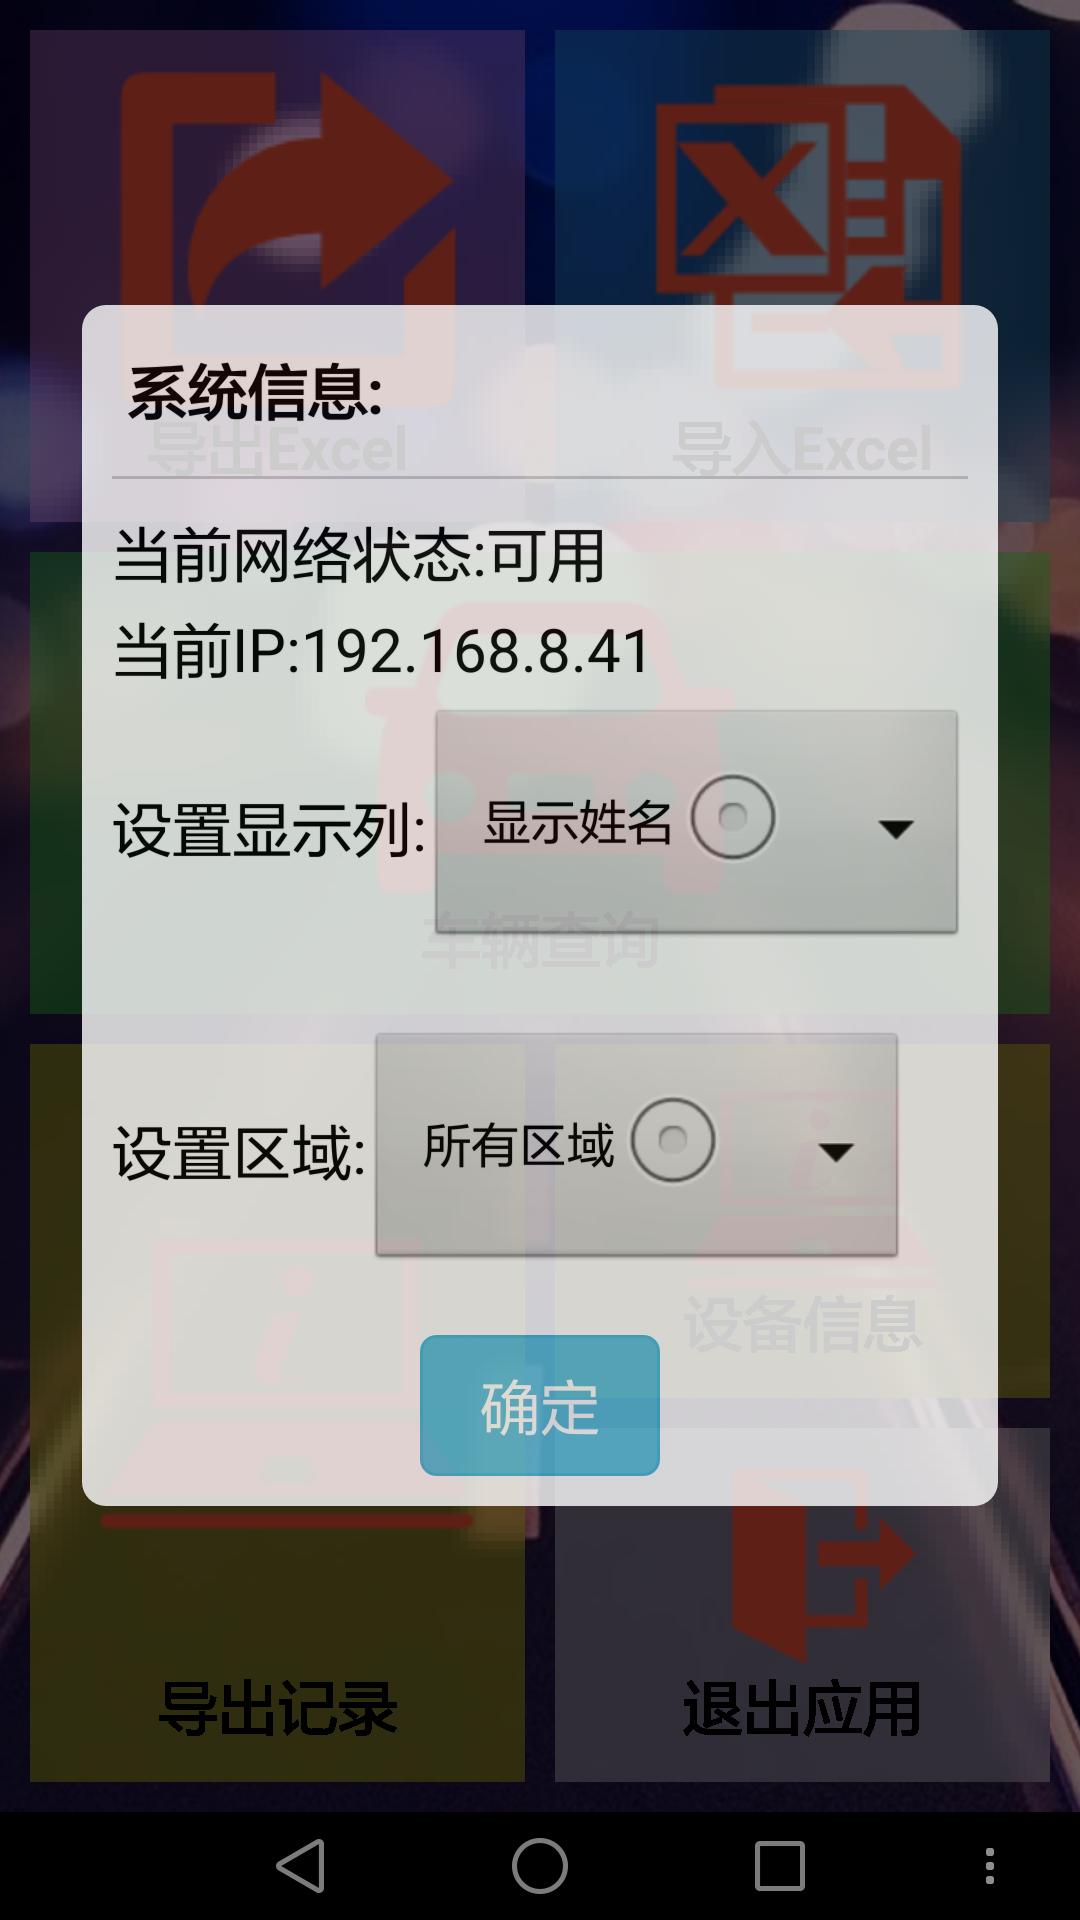 360手机助手截图1017_15_07_02.png